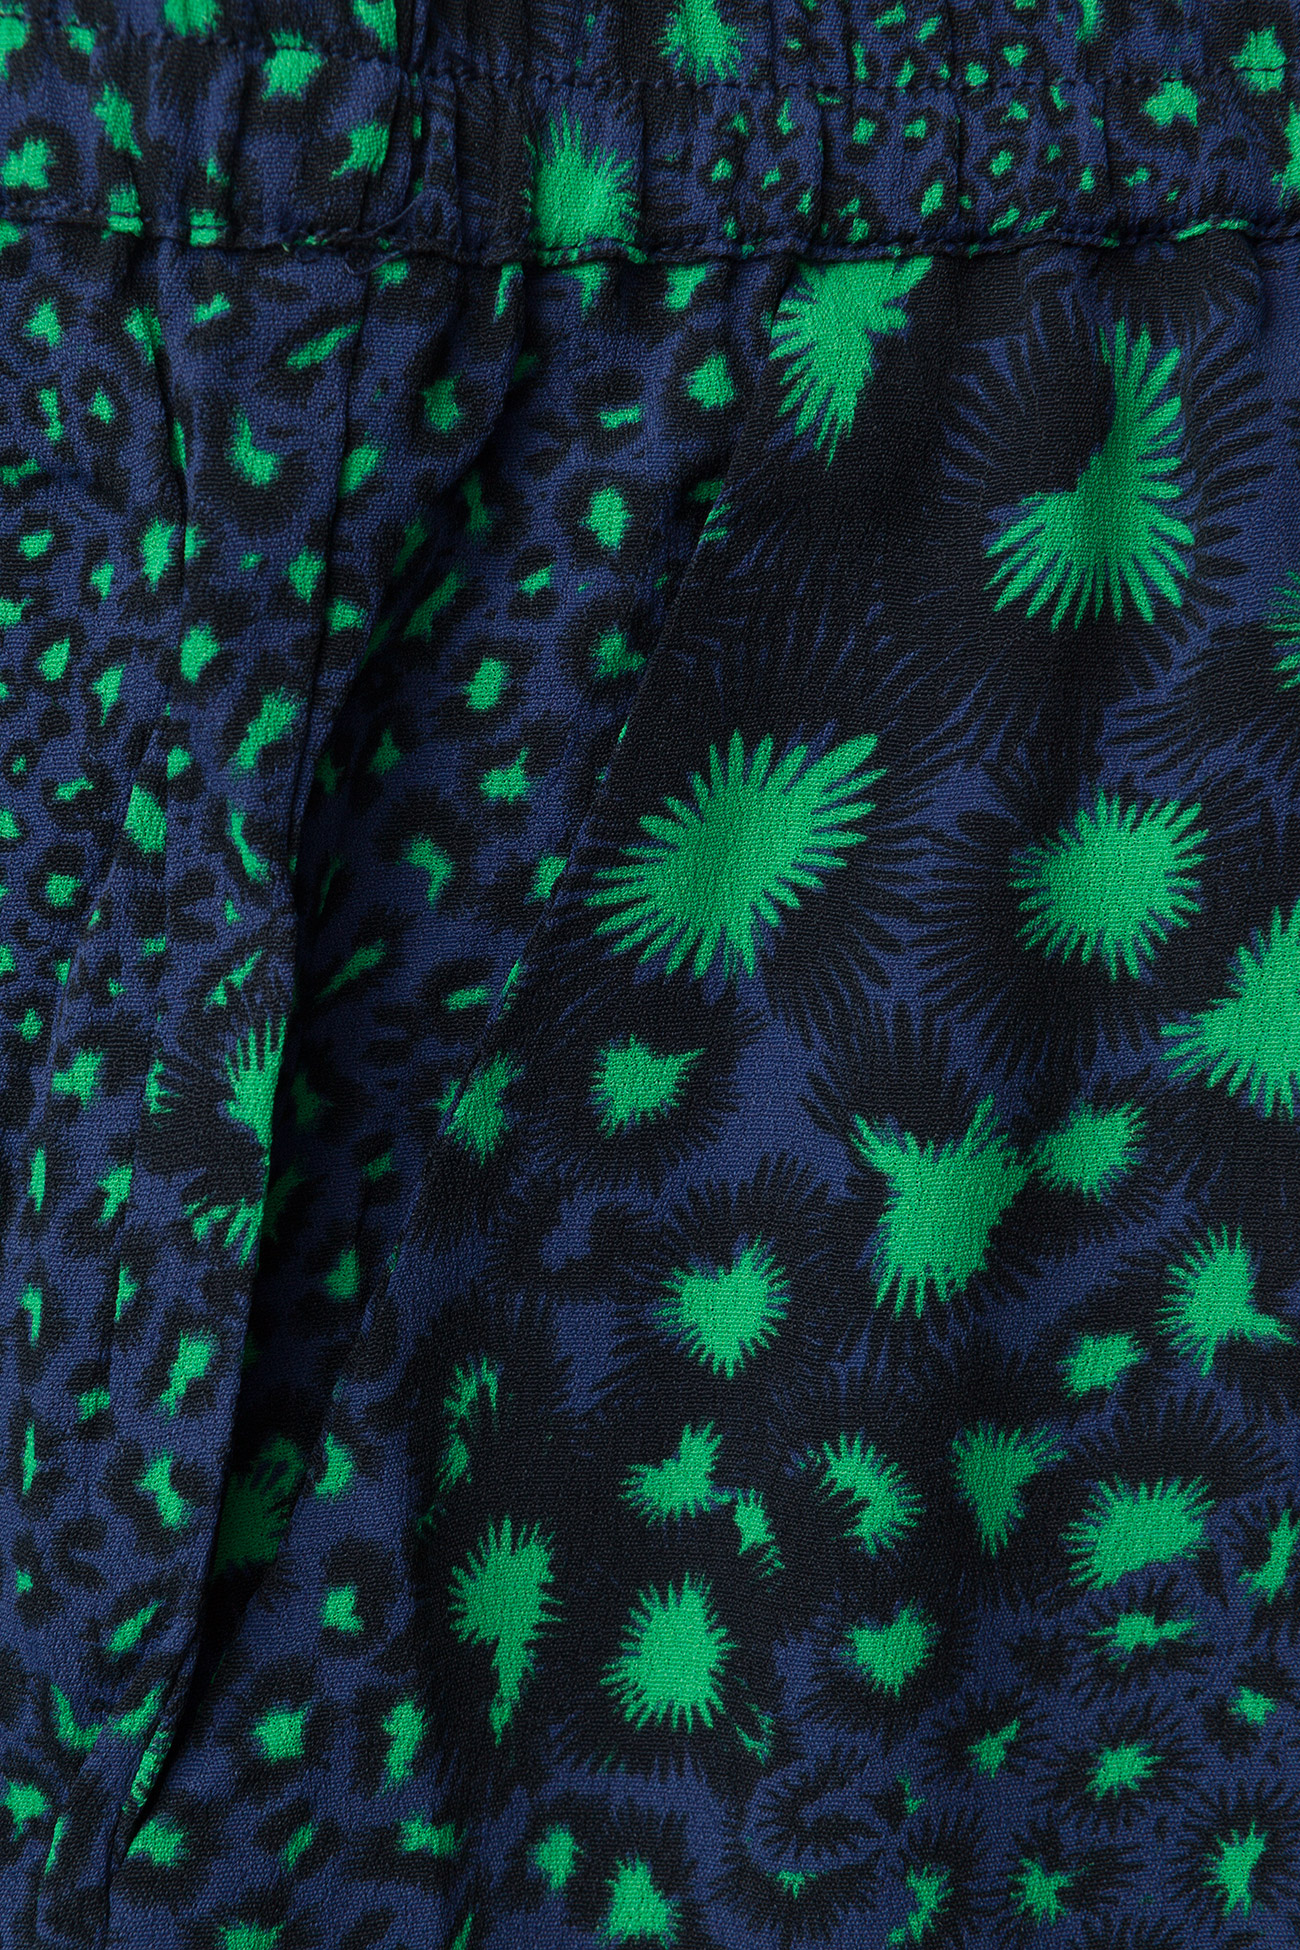 Printedsodalite Blue2ndday June 2nd Blue2ndday June Blue2ndday 2nd June 2nd Printedsodalite Printedsodalite QCoeWrdxEB